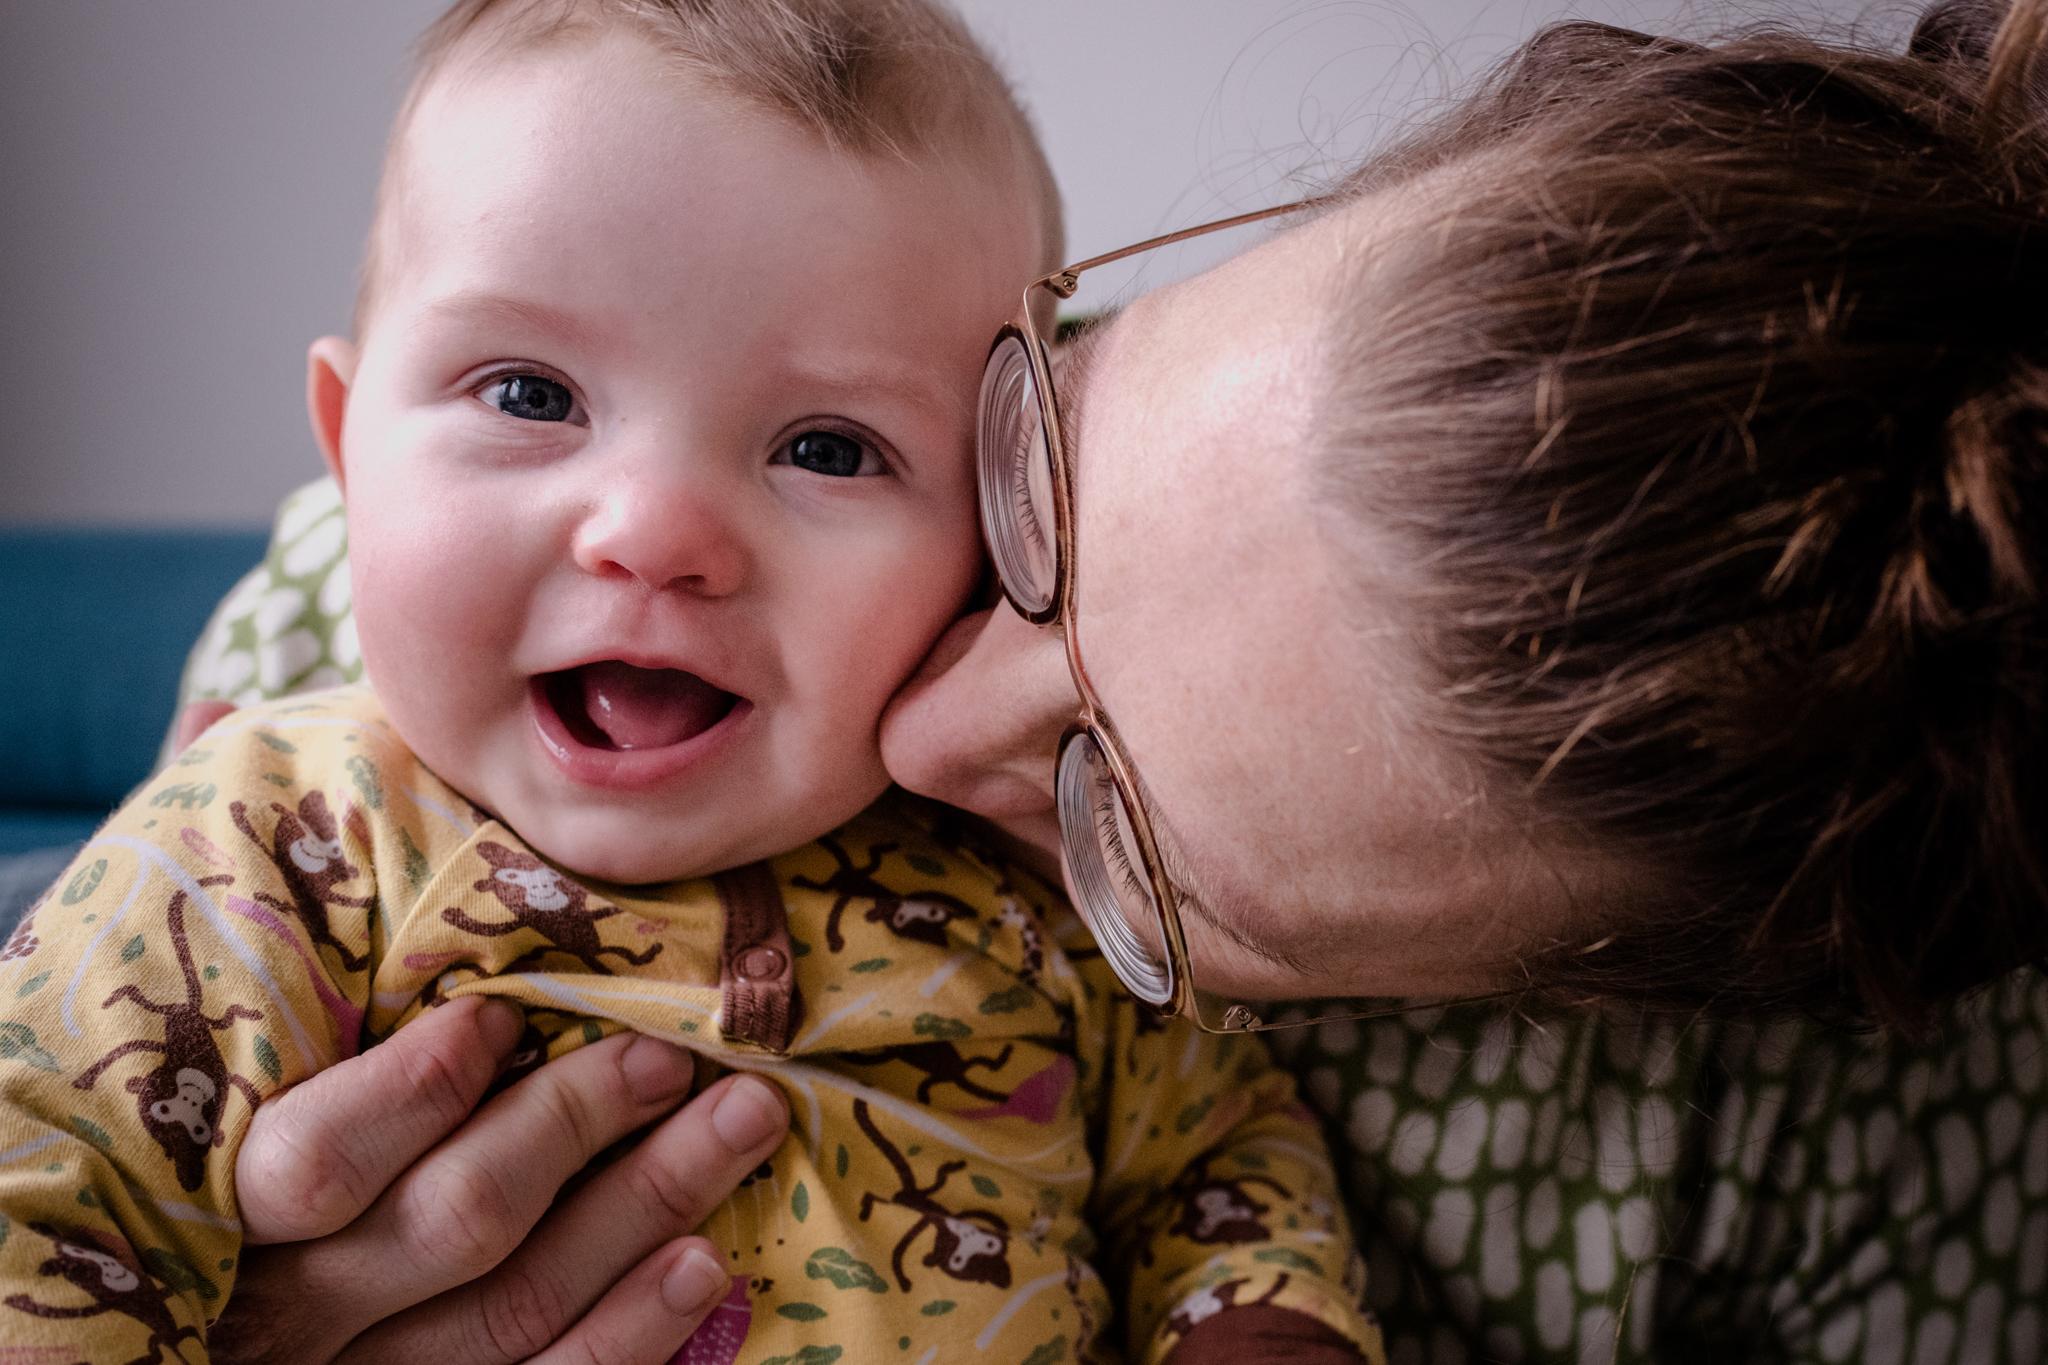 familiefoto's, familiefoto, thuis, tilburg, gezin, baby, mama, knuffelen